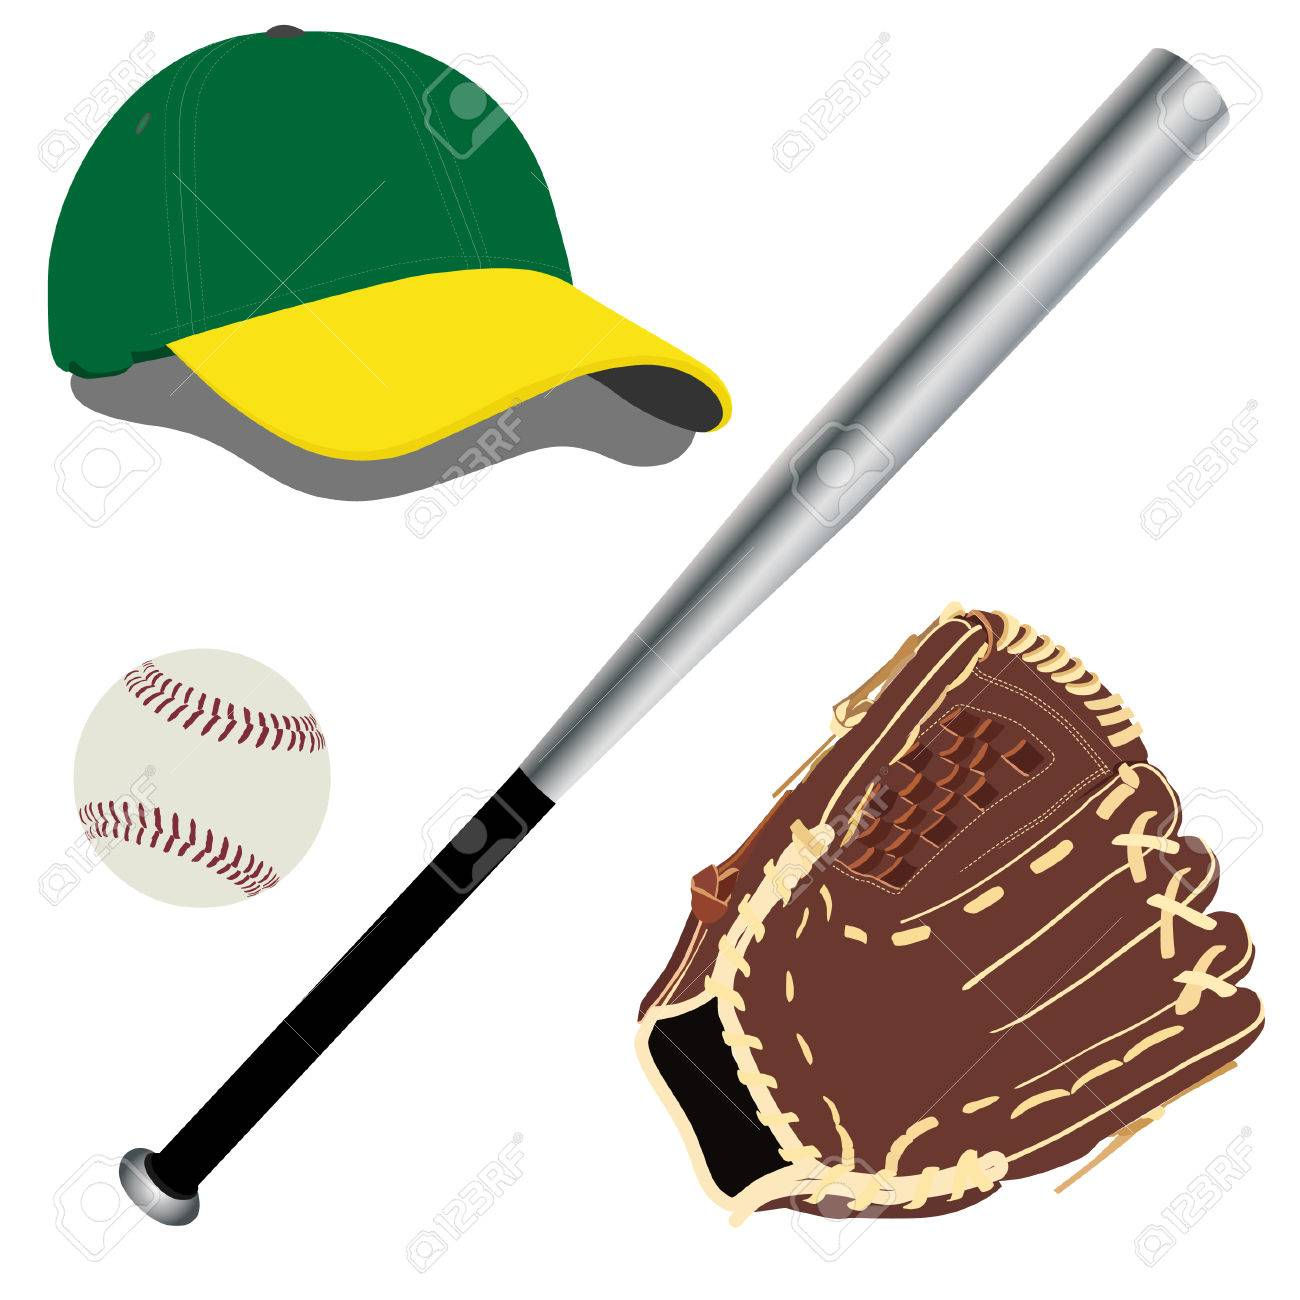 baseball cap baseball hat baseball bat baseball glove royalty rh 123rf com Baseball Bat Vector Silhouette Baseball Bat Clip Art